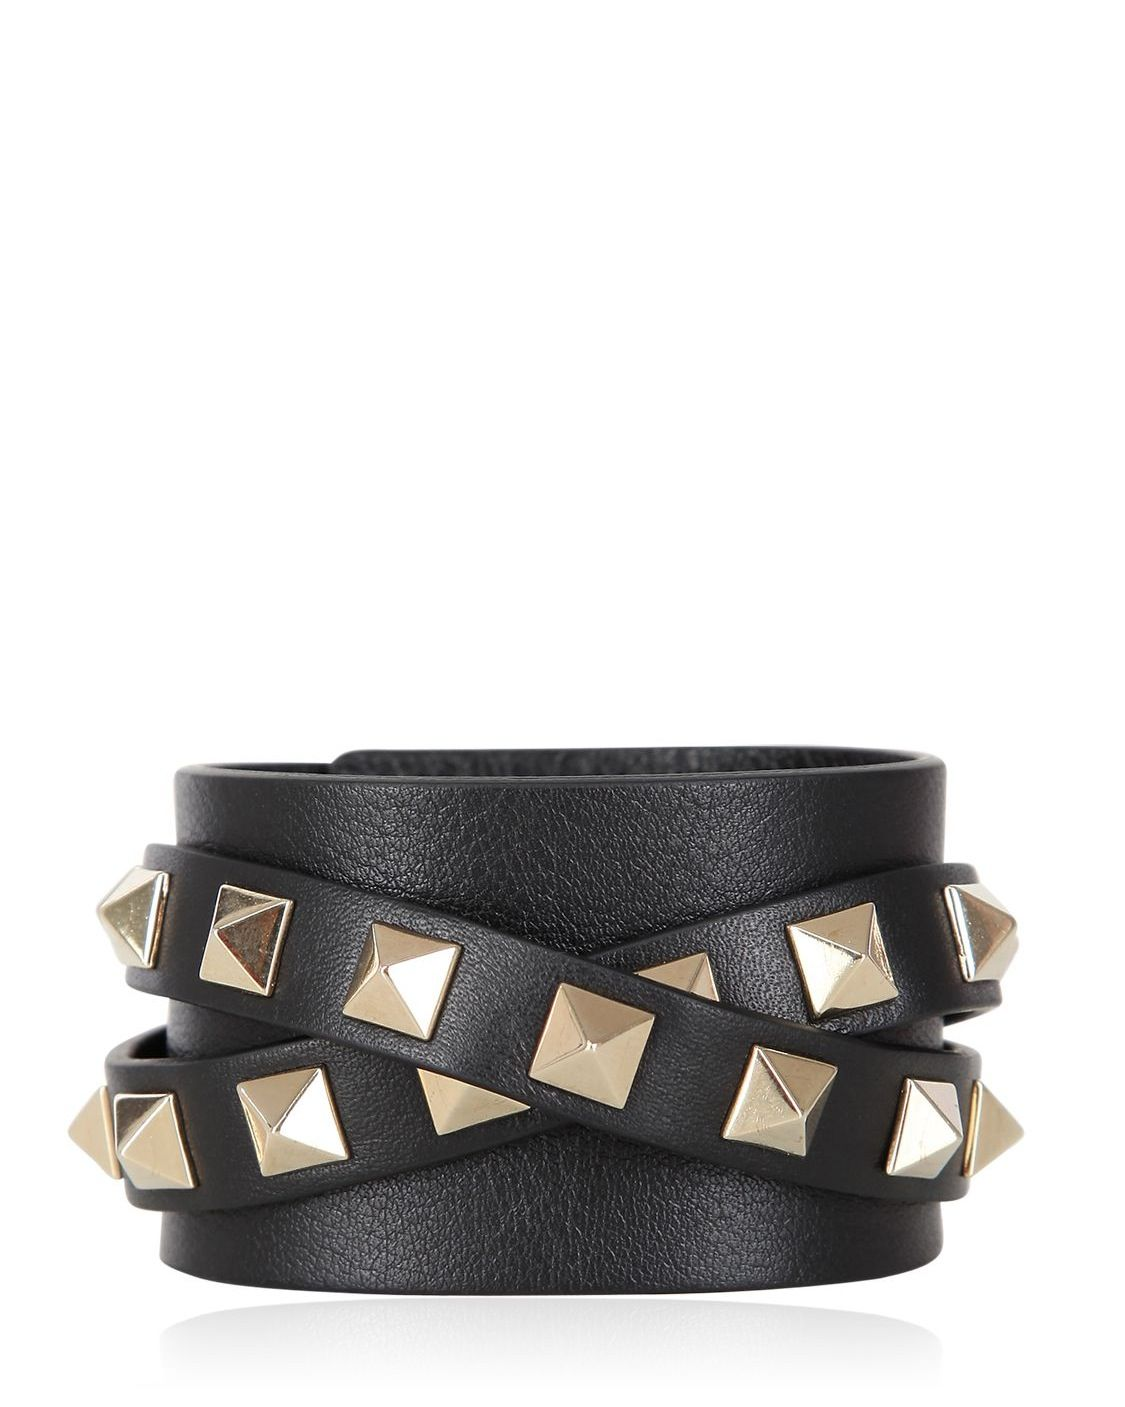 Valentino Rockstud Leather Cuff Bracelet B27hxs